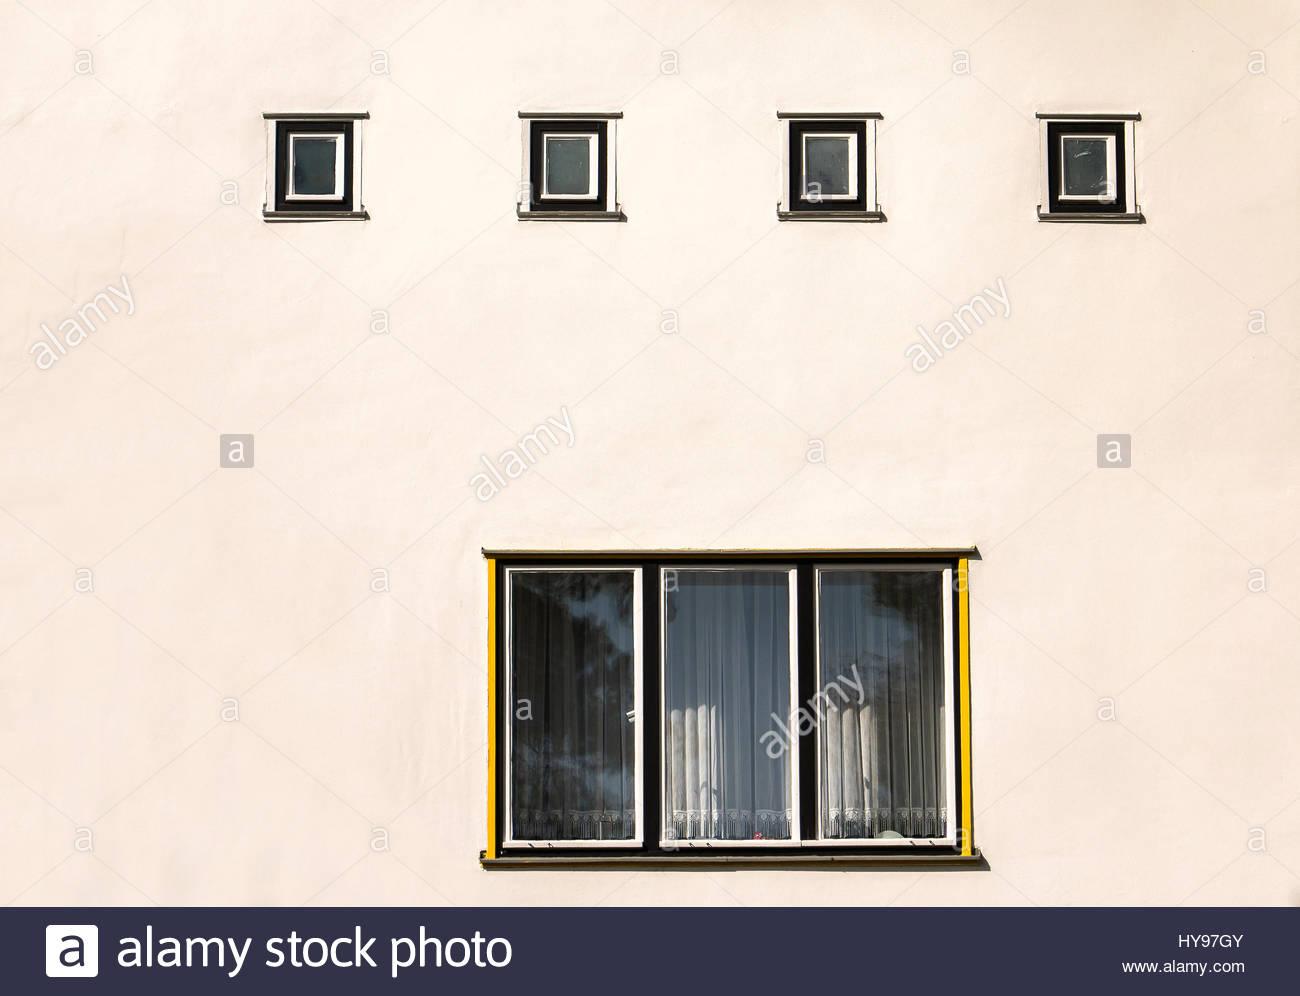 bruno taut architecture stockfotos bruno taut architecture bilder alamy. Black Bedroom Furniture Sets. Home Design Ideas